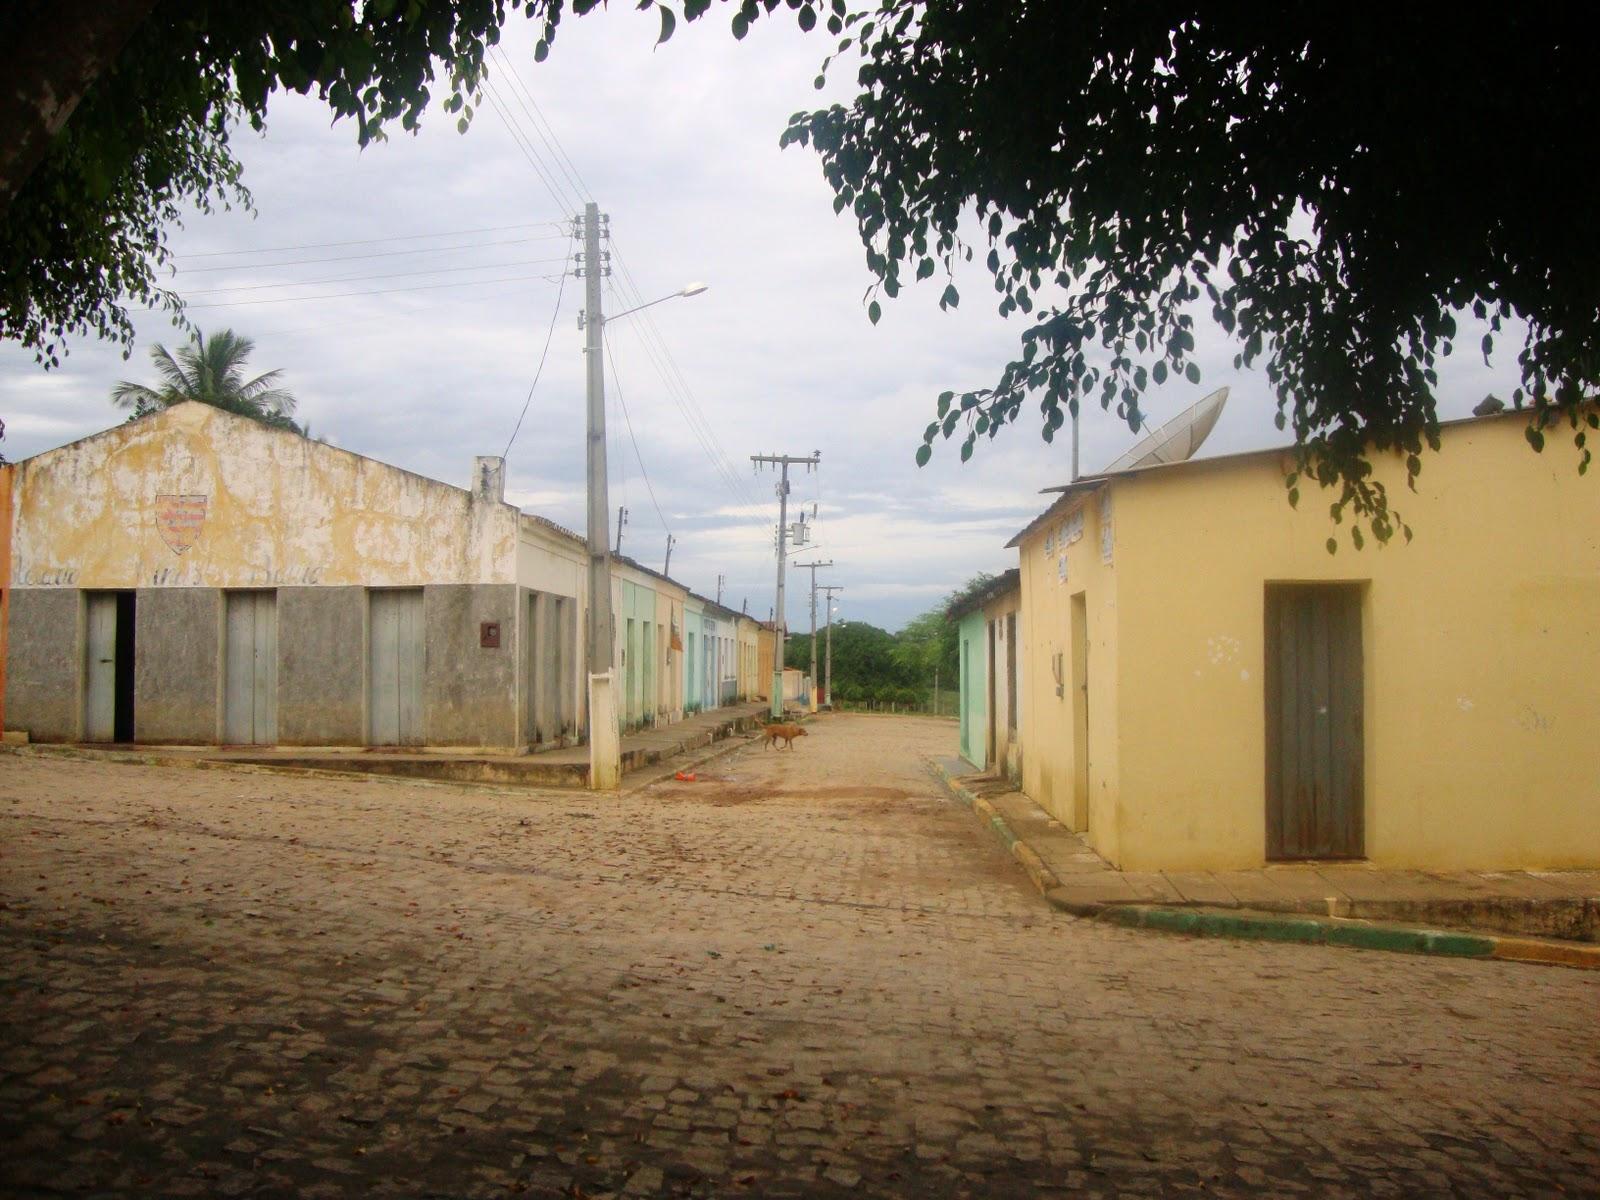 Distrito da Feirinha